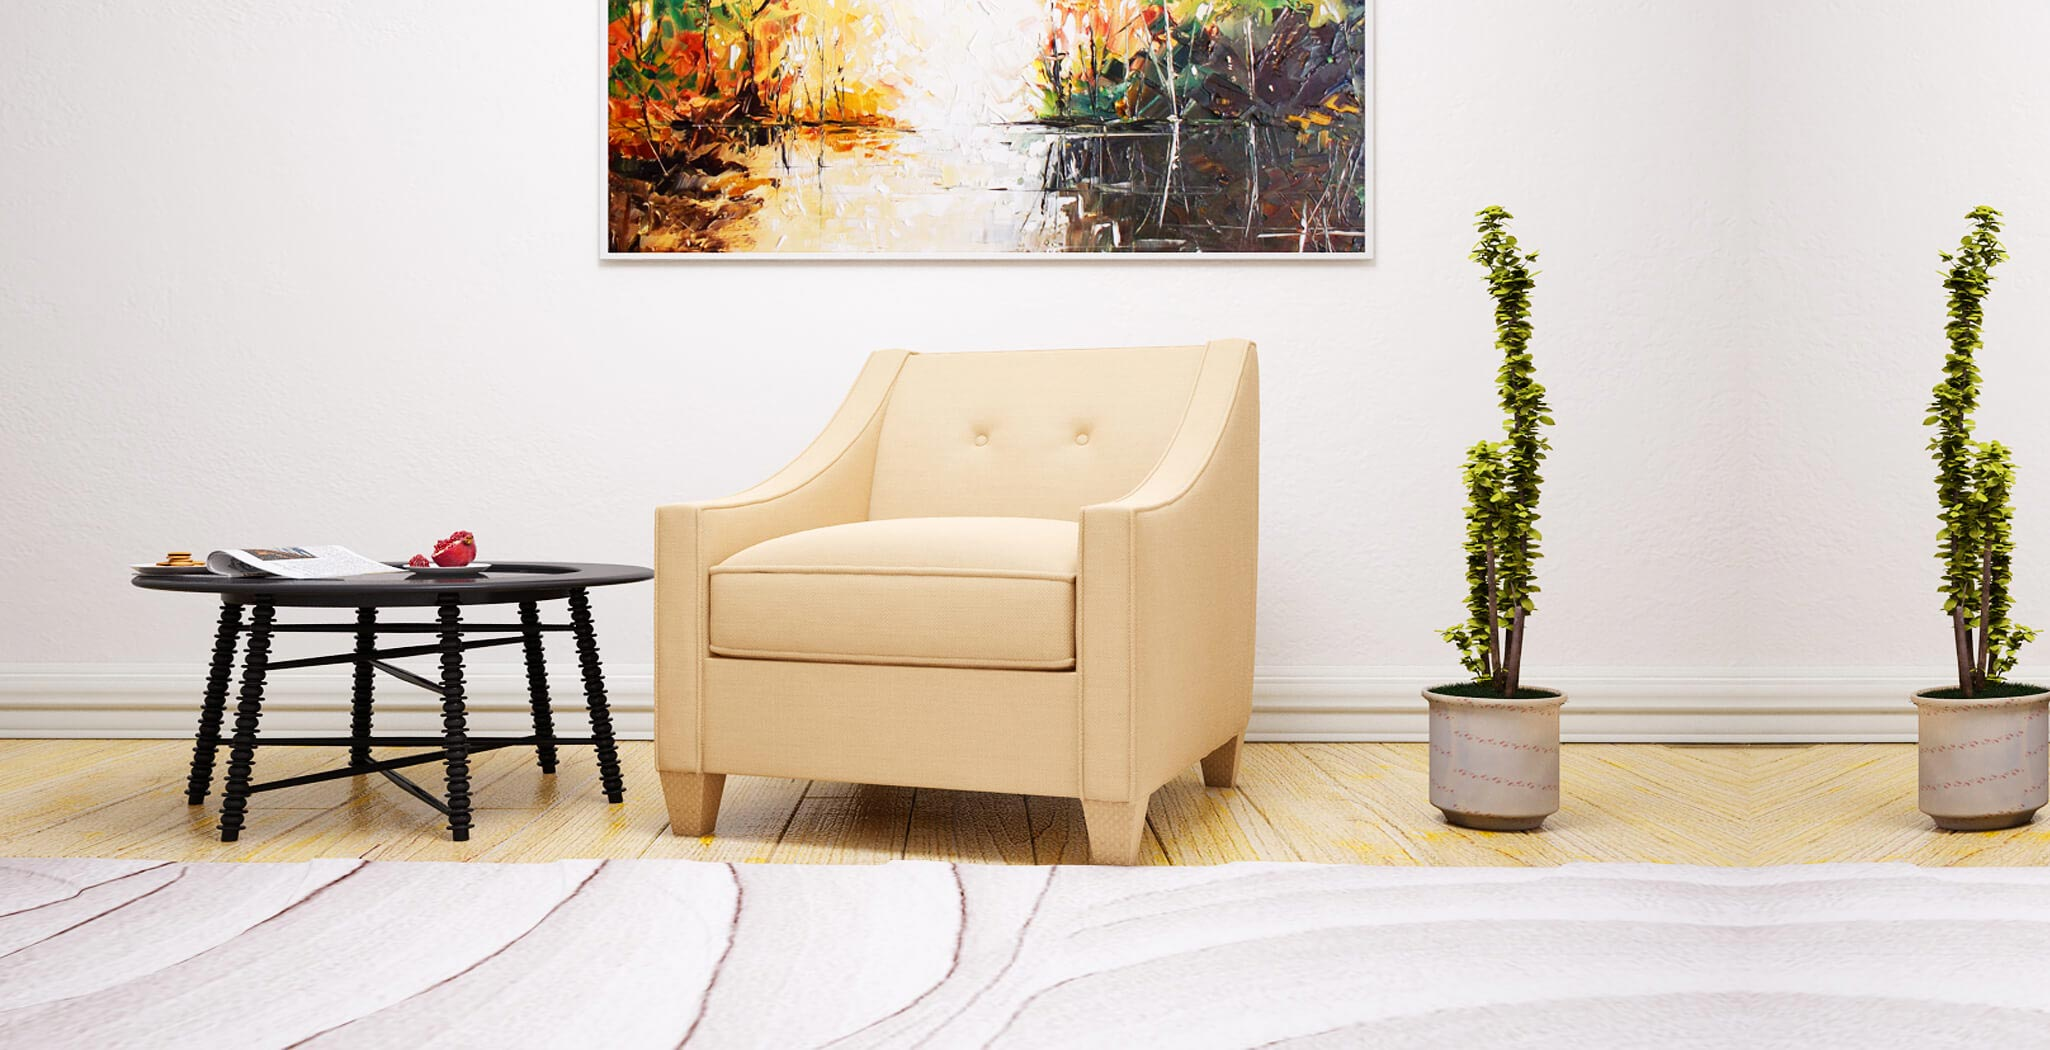 berlin chair furniture gallery 4